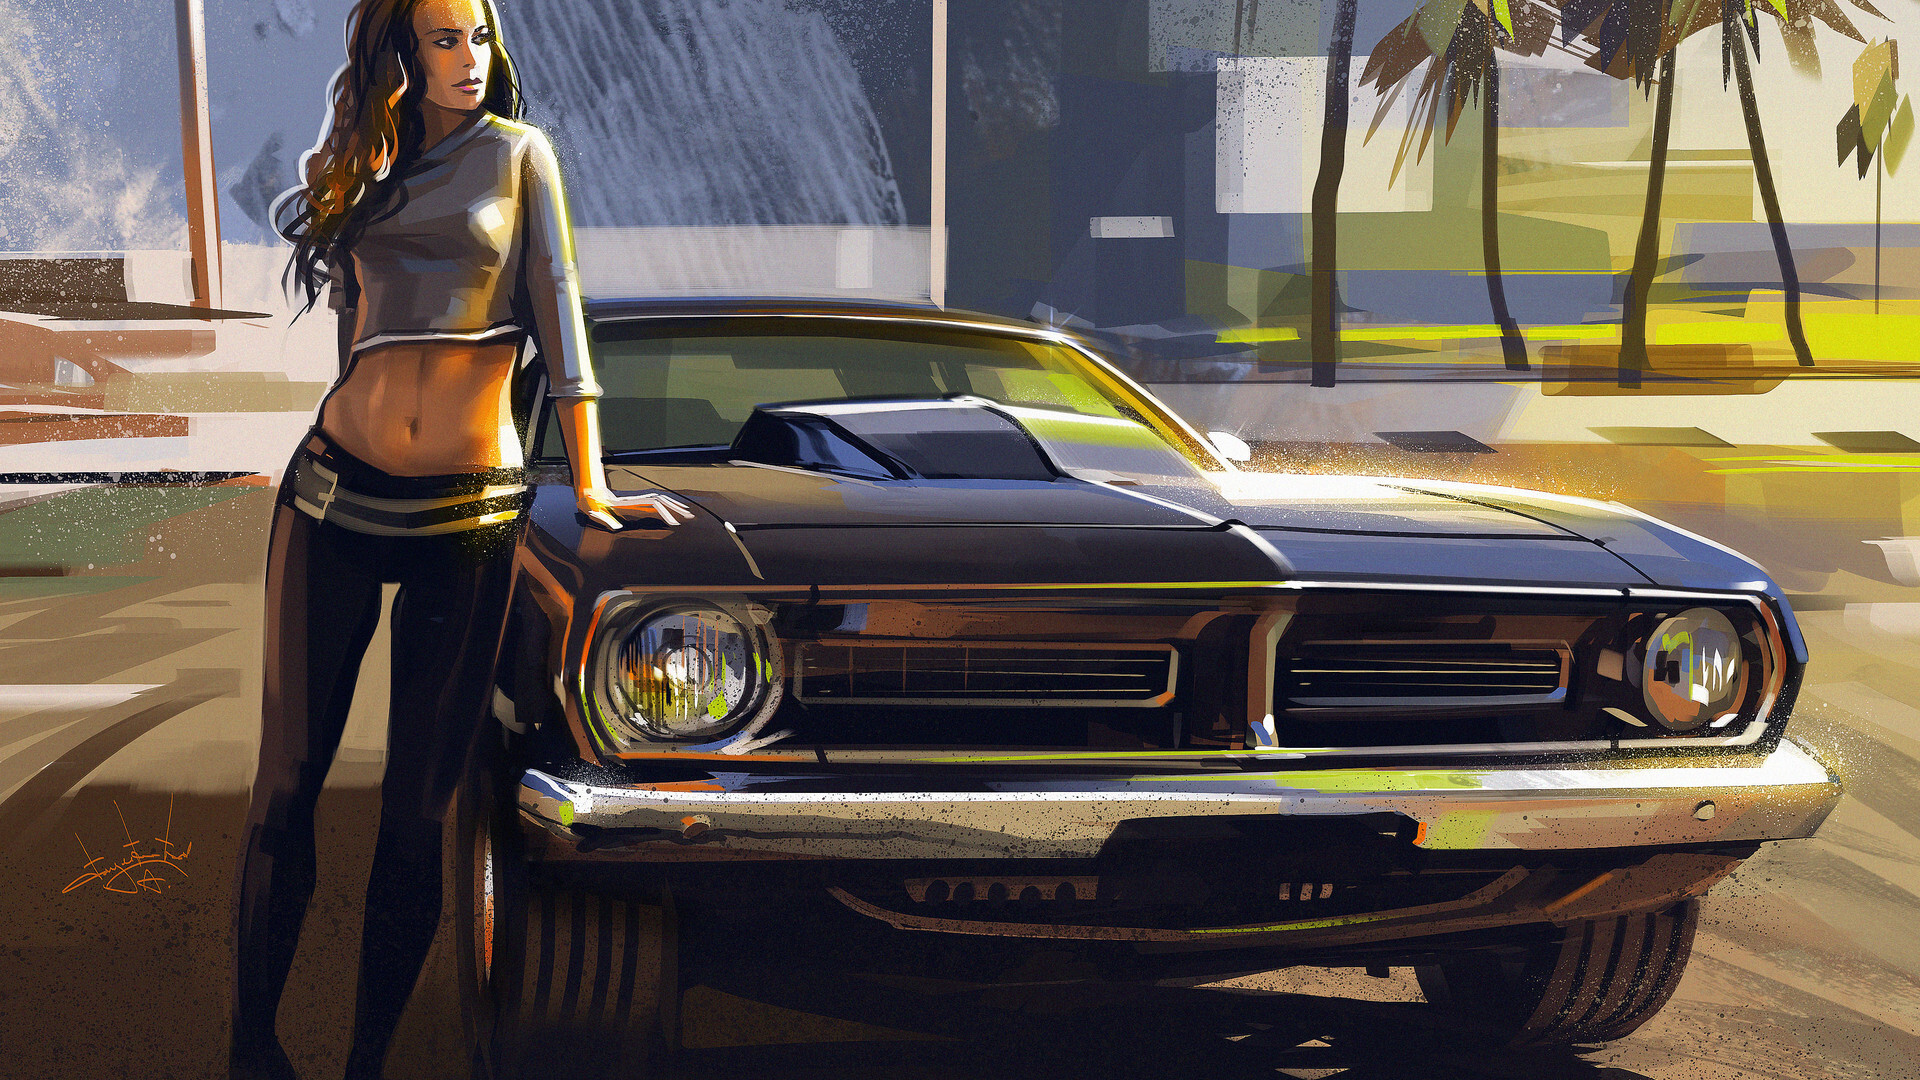 1001 1 Hd Image Fix Cars Free Download Hd Wallpapers: 1920x1080 Car And Girl Artwork Laptop Full HD 1080P HD 4k